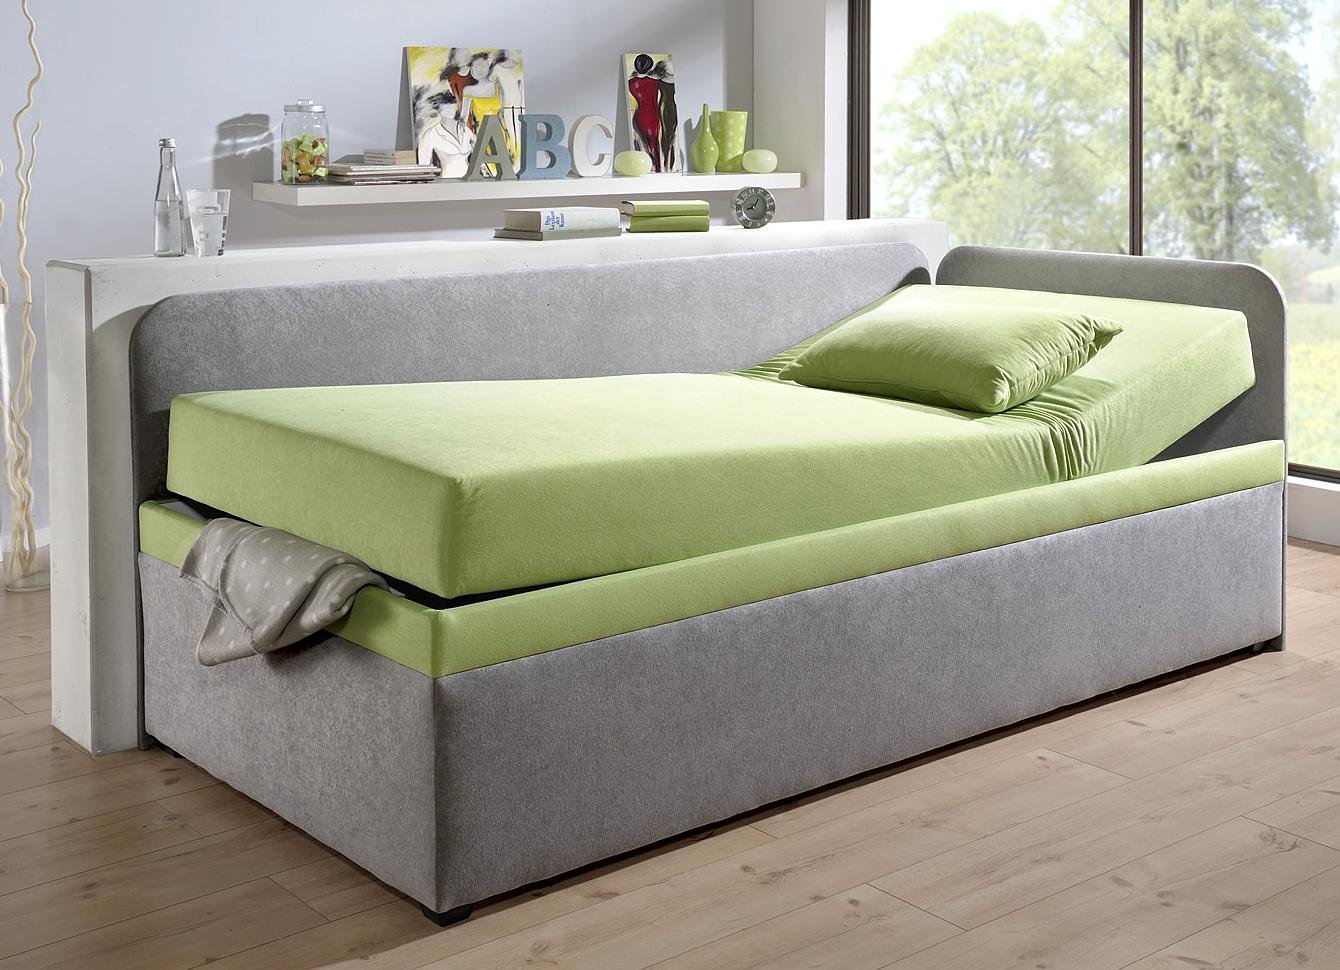 studioliege in verschiedenen ausf hrungen betten bader. Black Bedroom Furniture Sets. Home Design Ideas